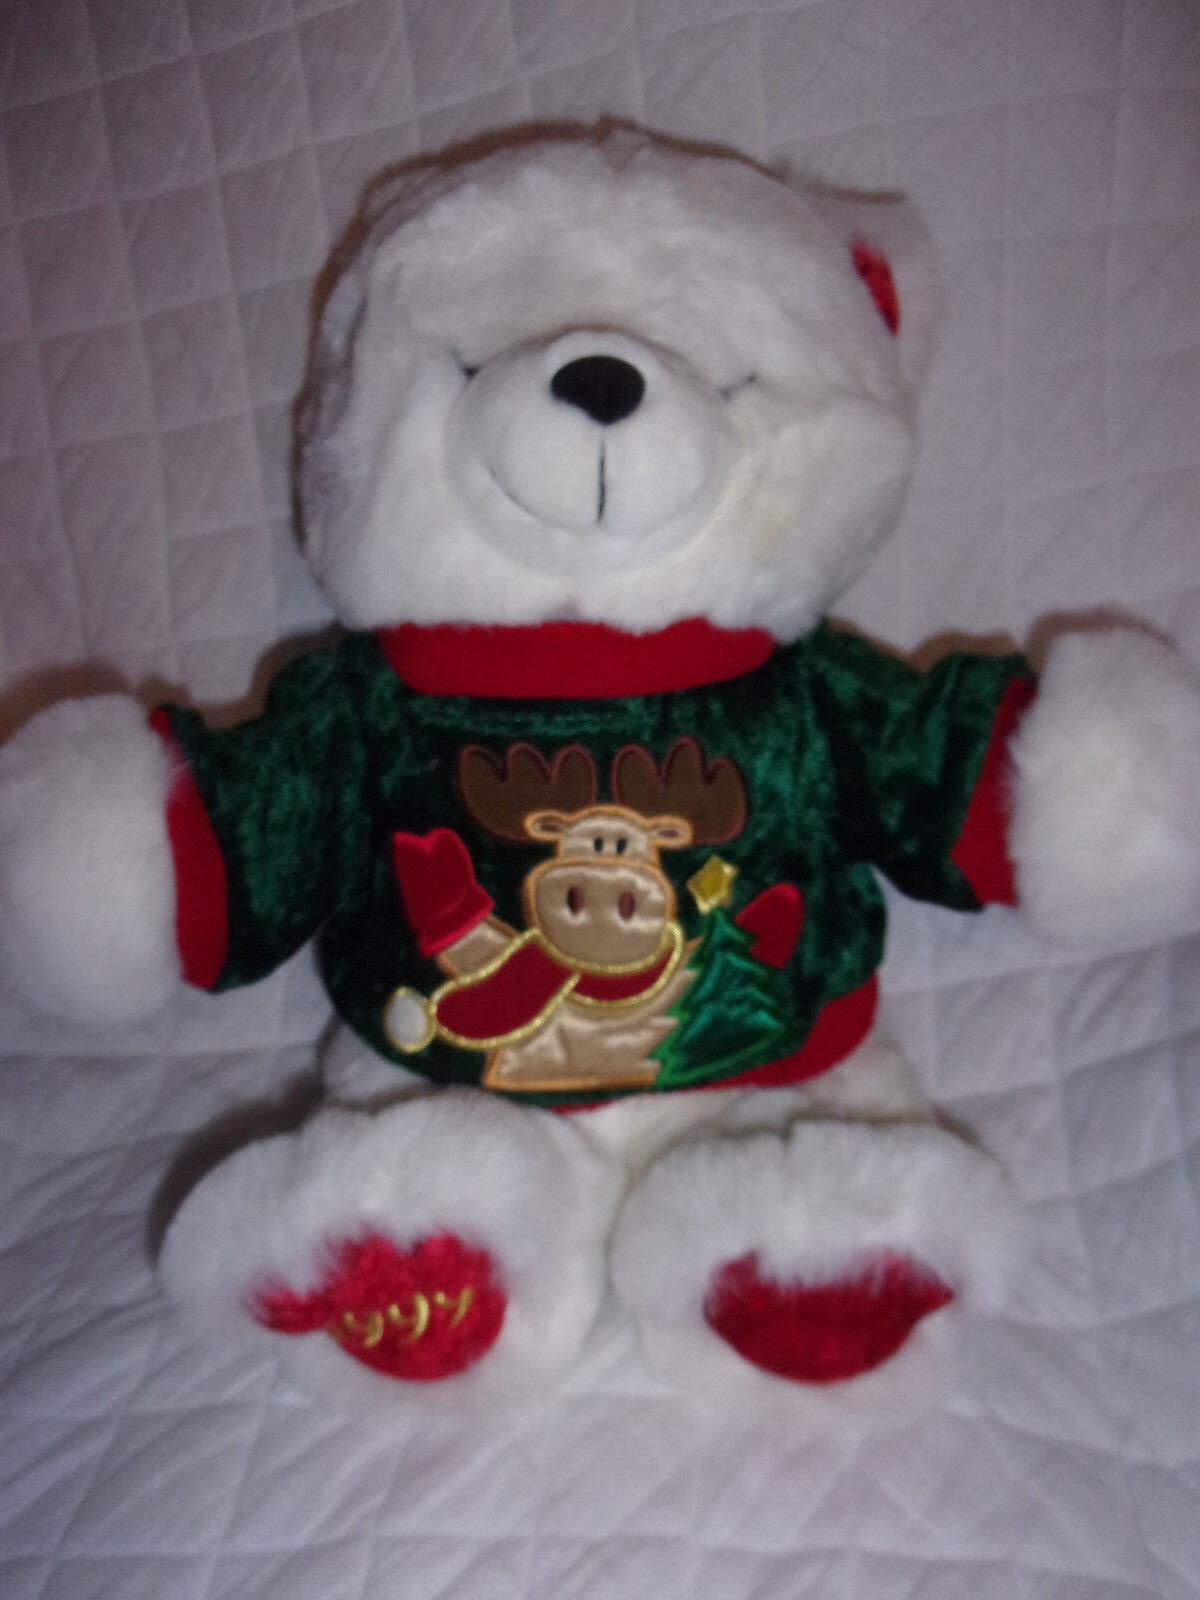 1999 Main Joy Holiday 1999 Teddy Bear Moose 18  Plush Soft Toy Stuffed Animal